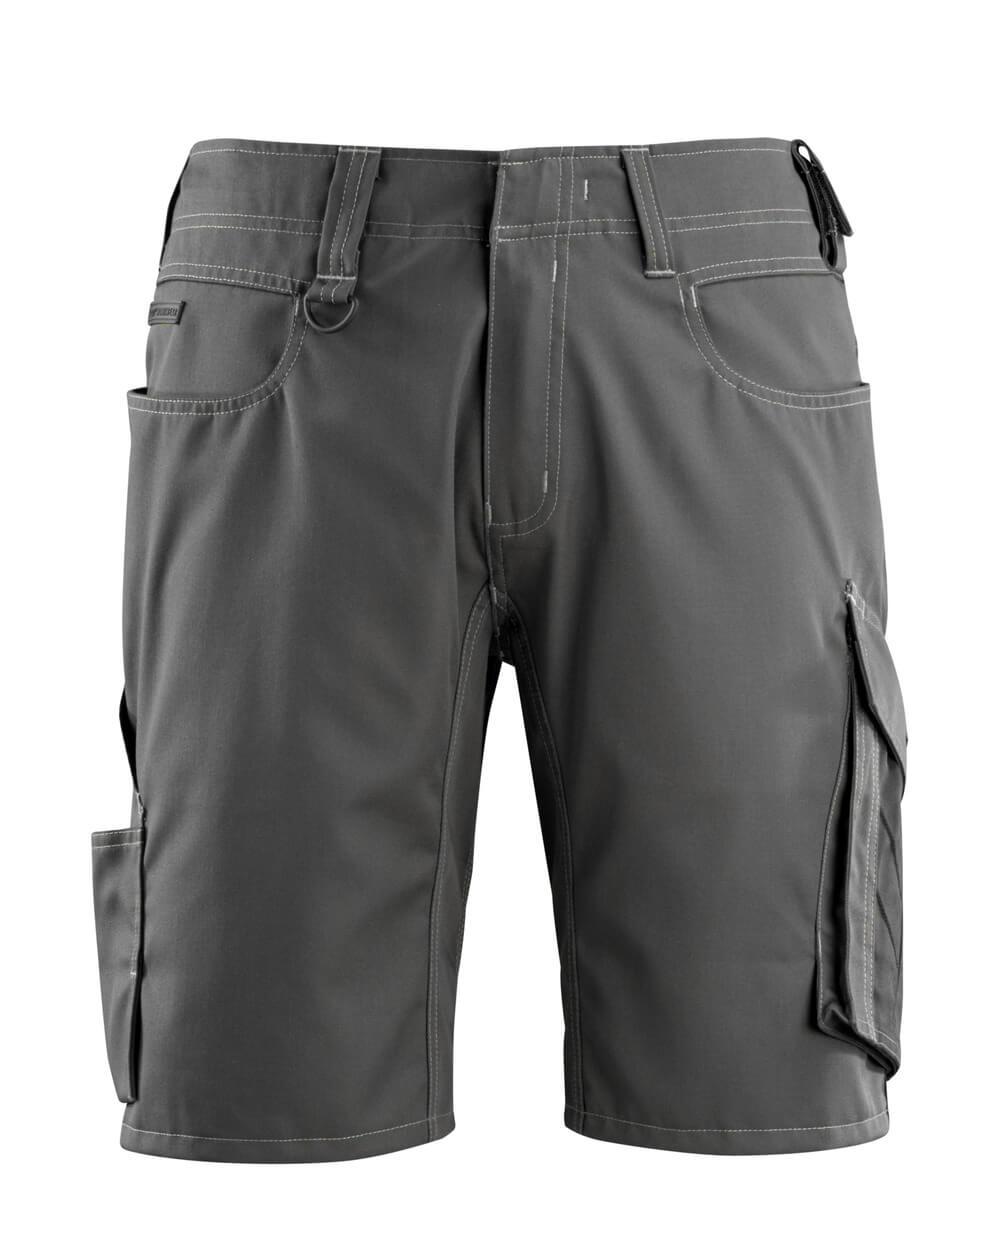 12049-442-1809 Pantalones cortos - antracita oscuro/negro